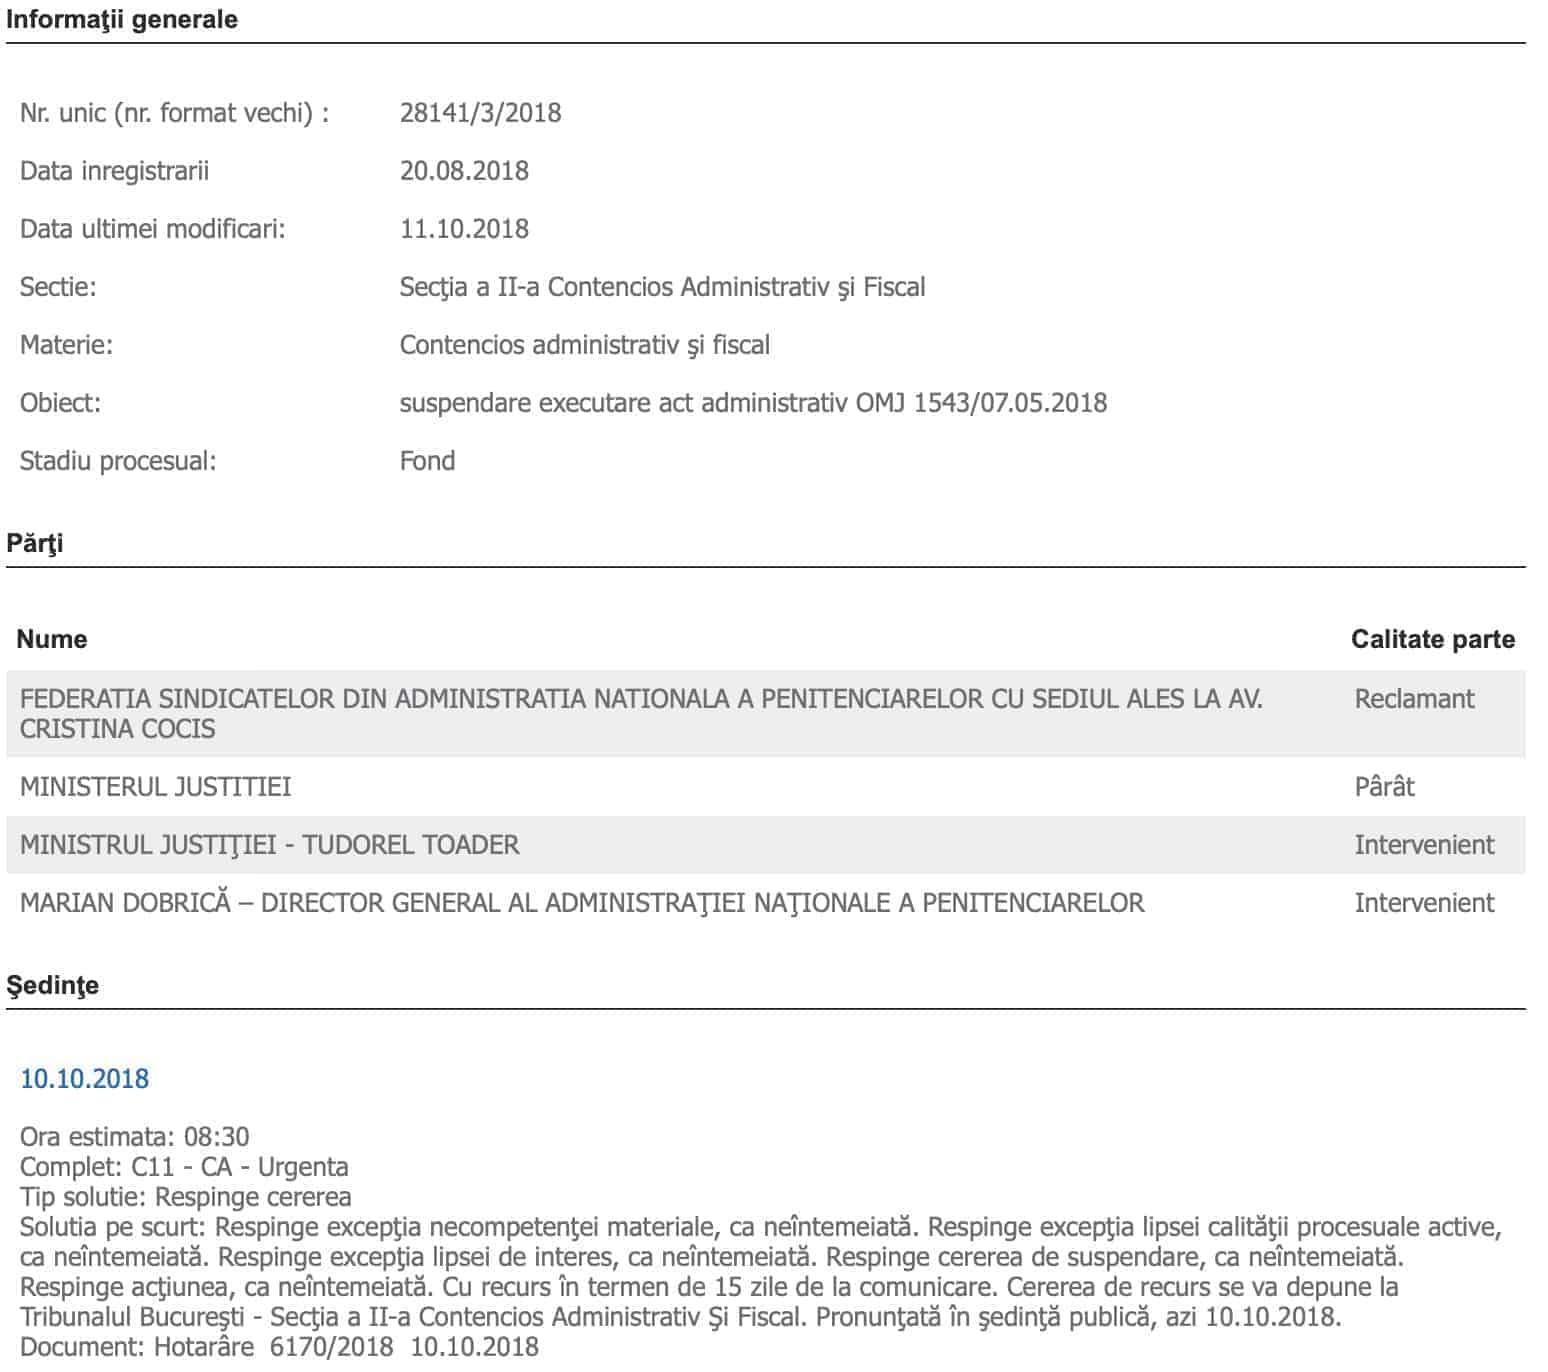 Dosar 28141:3:2018 - suspendare executare act administrativ OMJ 1543:07.05.2018